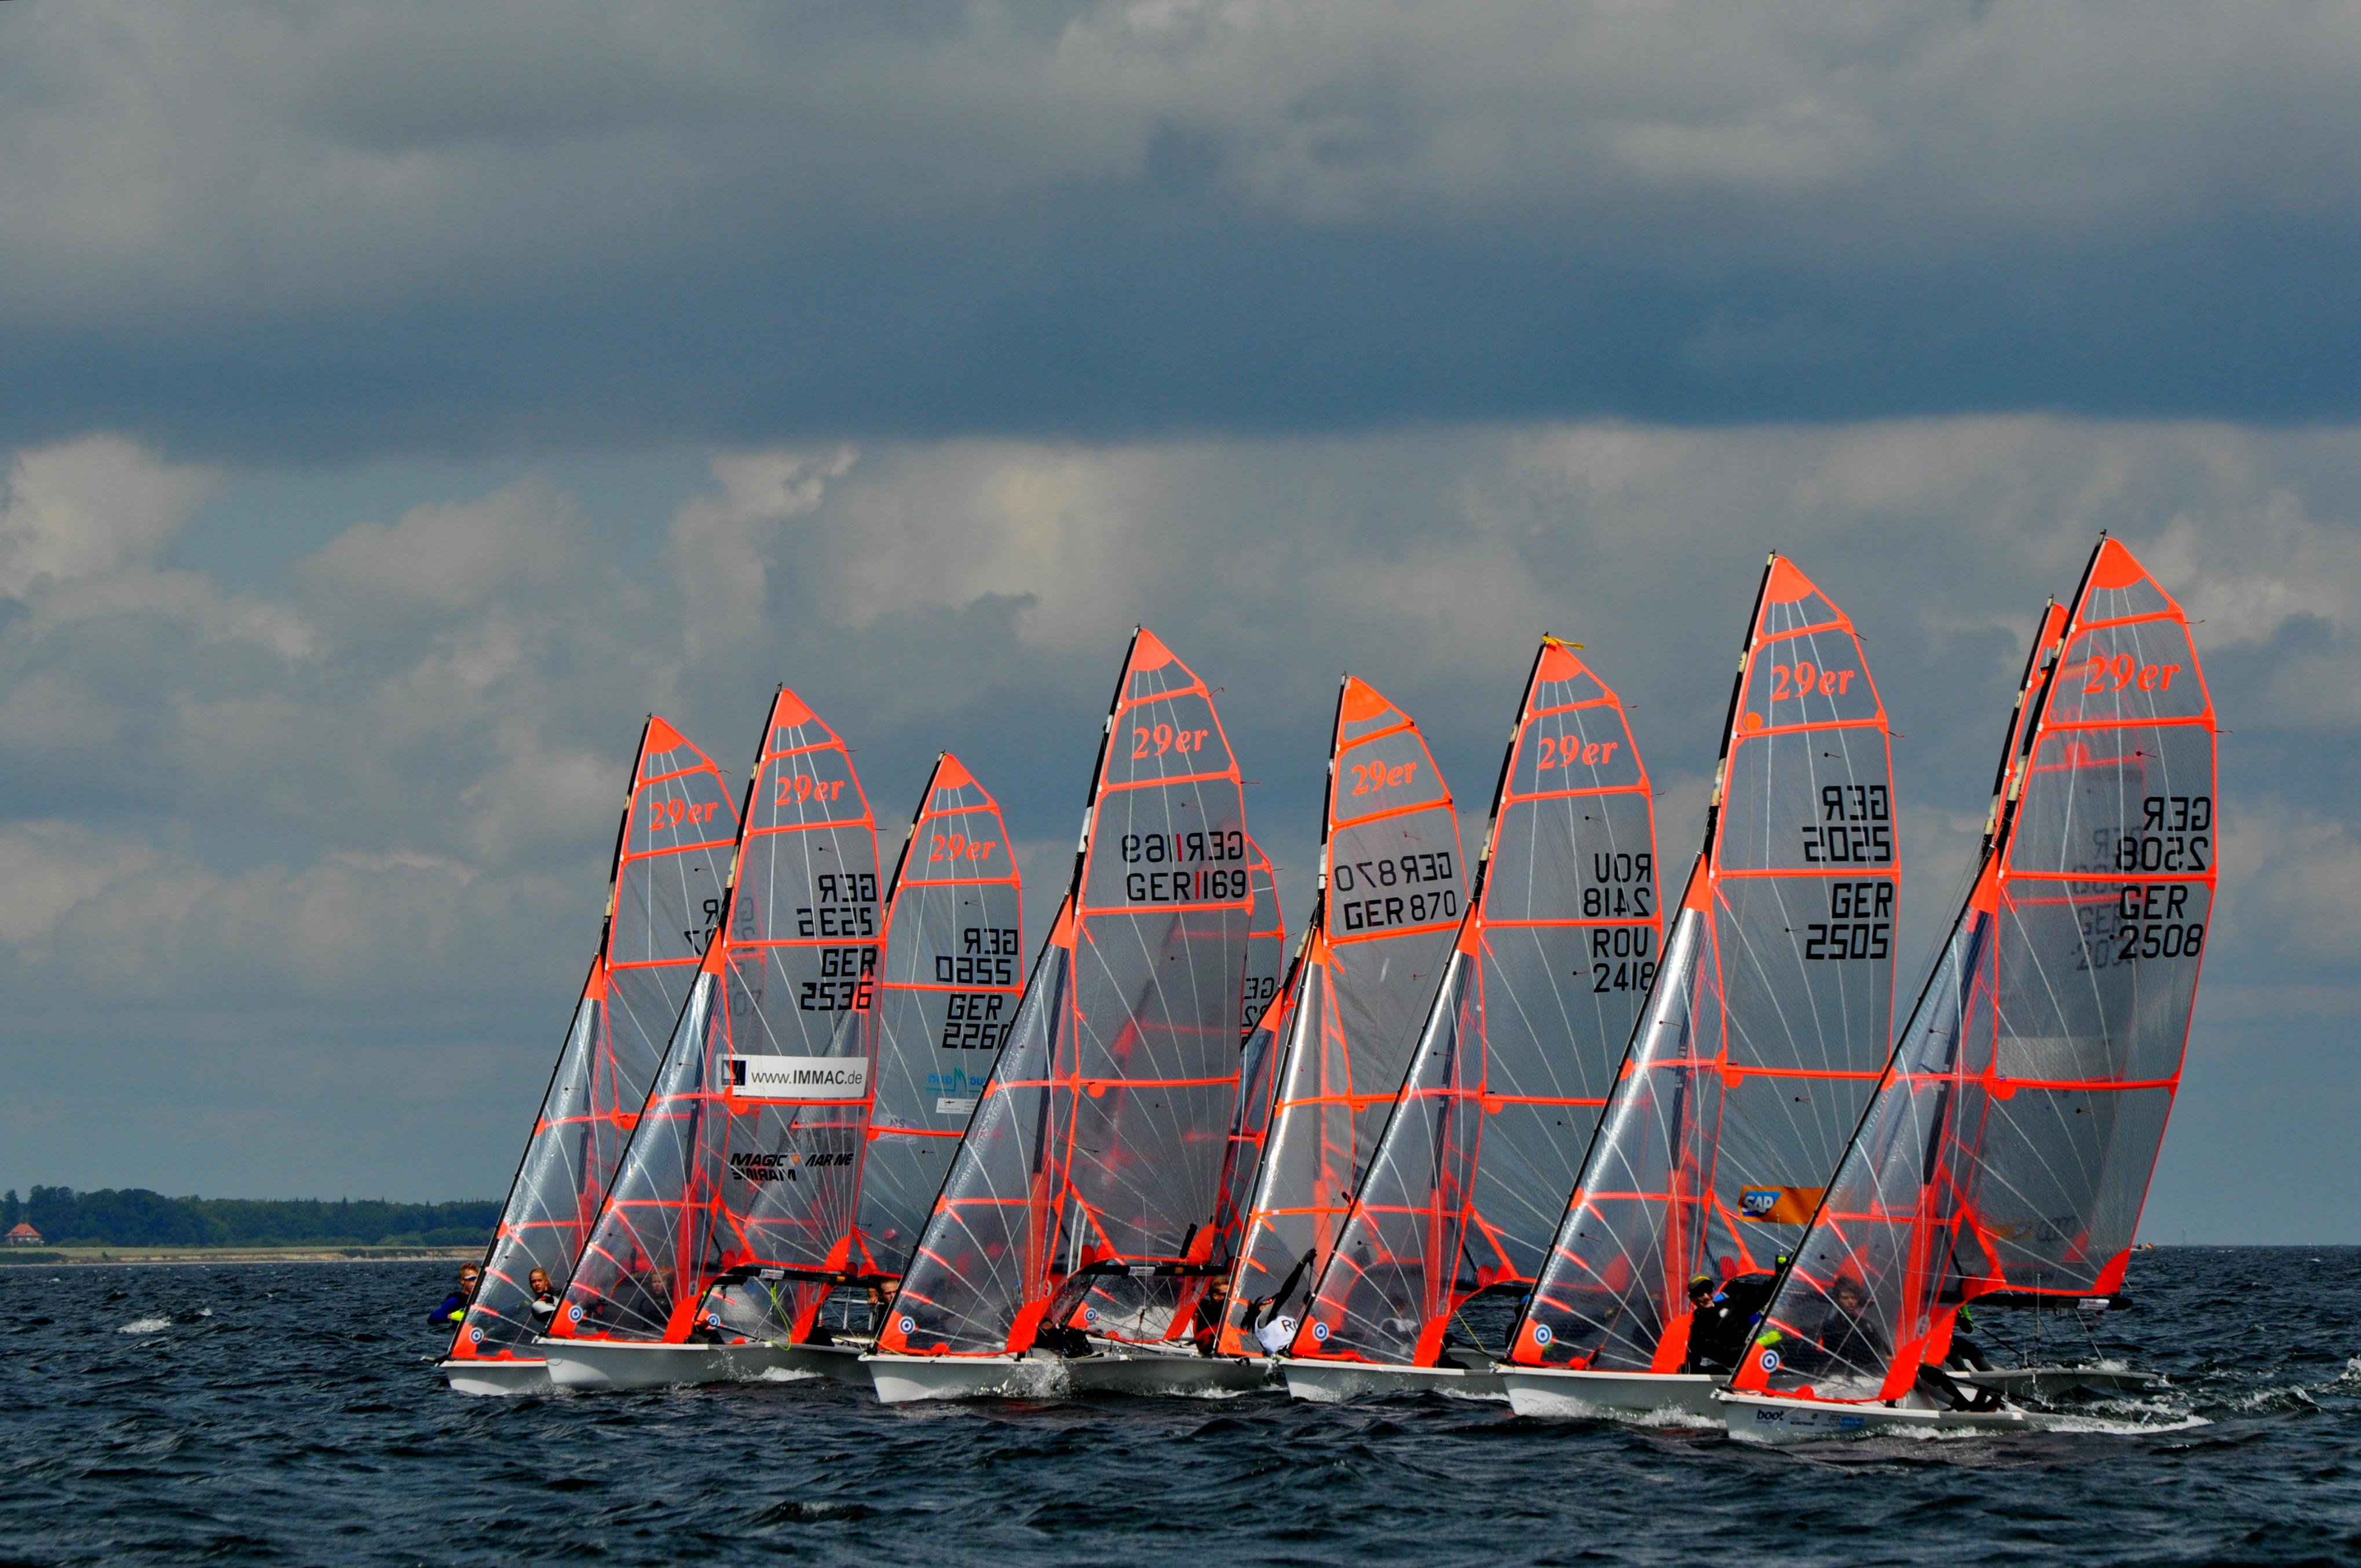 29er training segeln Ostsee Eckernförde